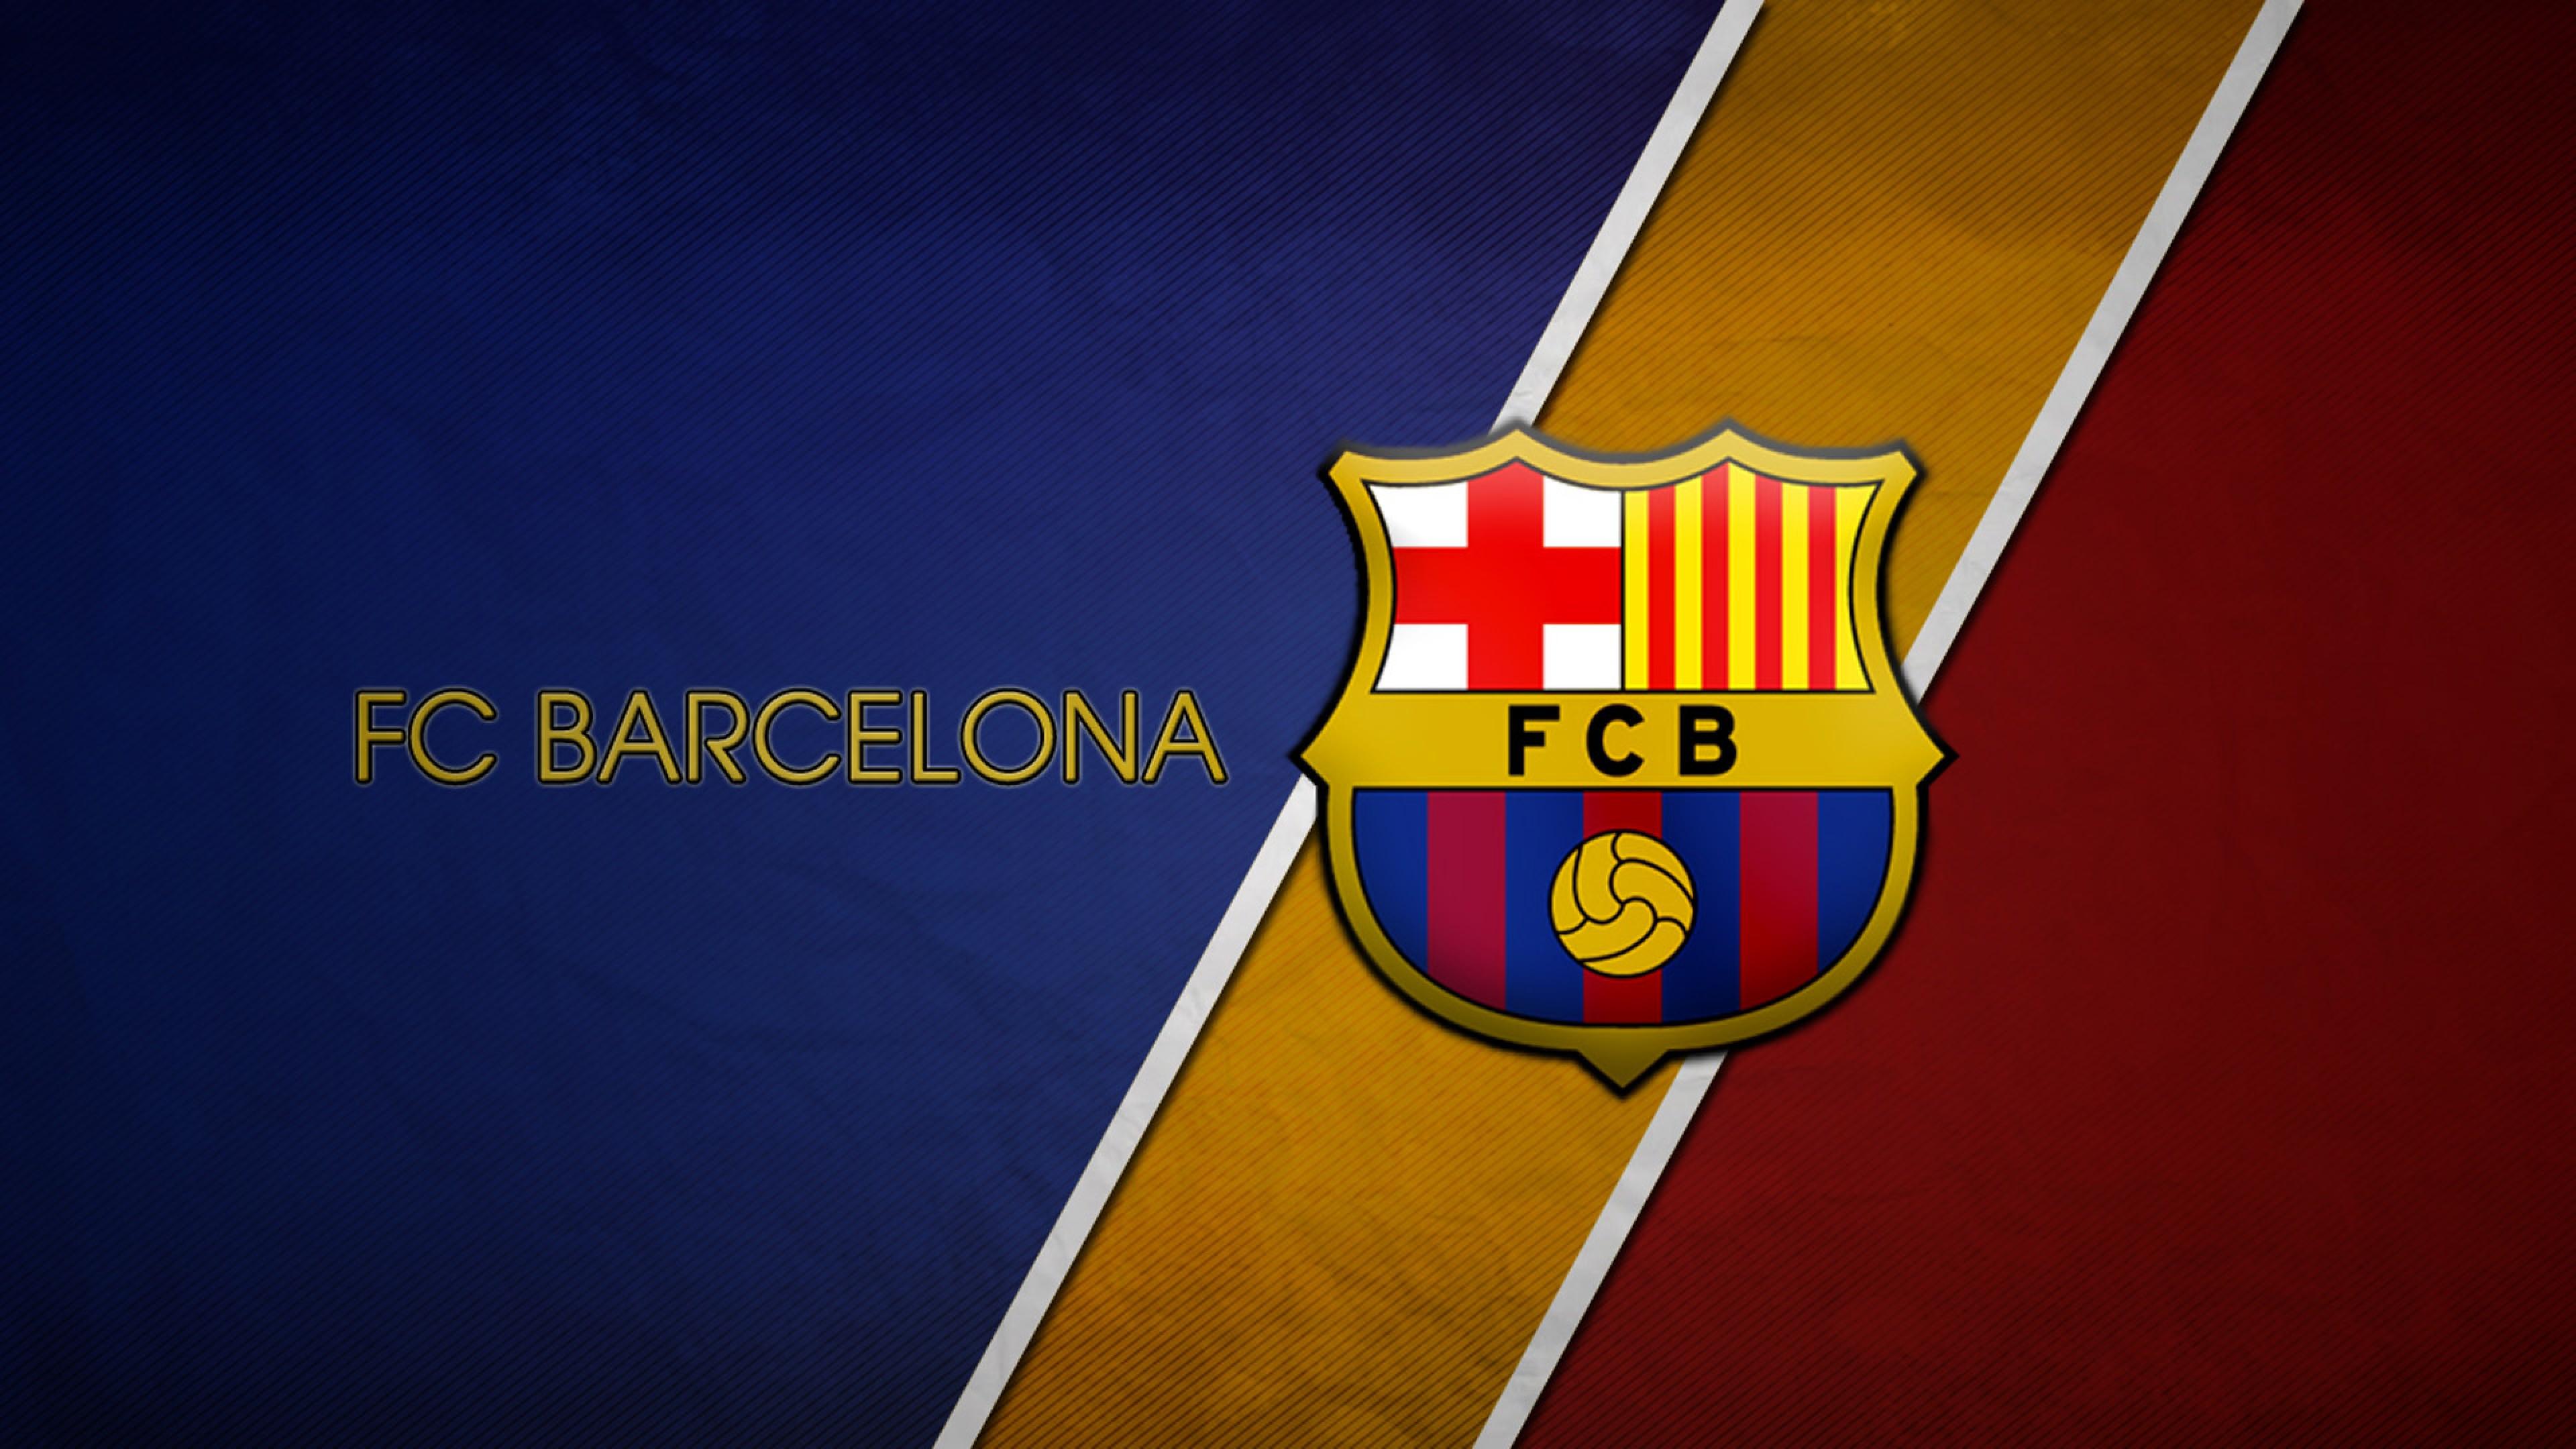 Hd Wallpapers Barcelona Logo Wallpapers Trend